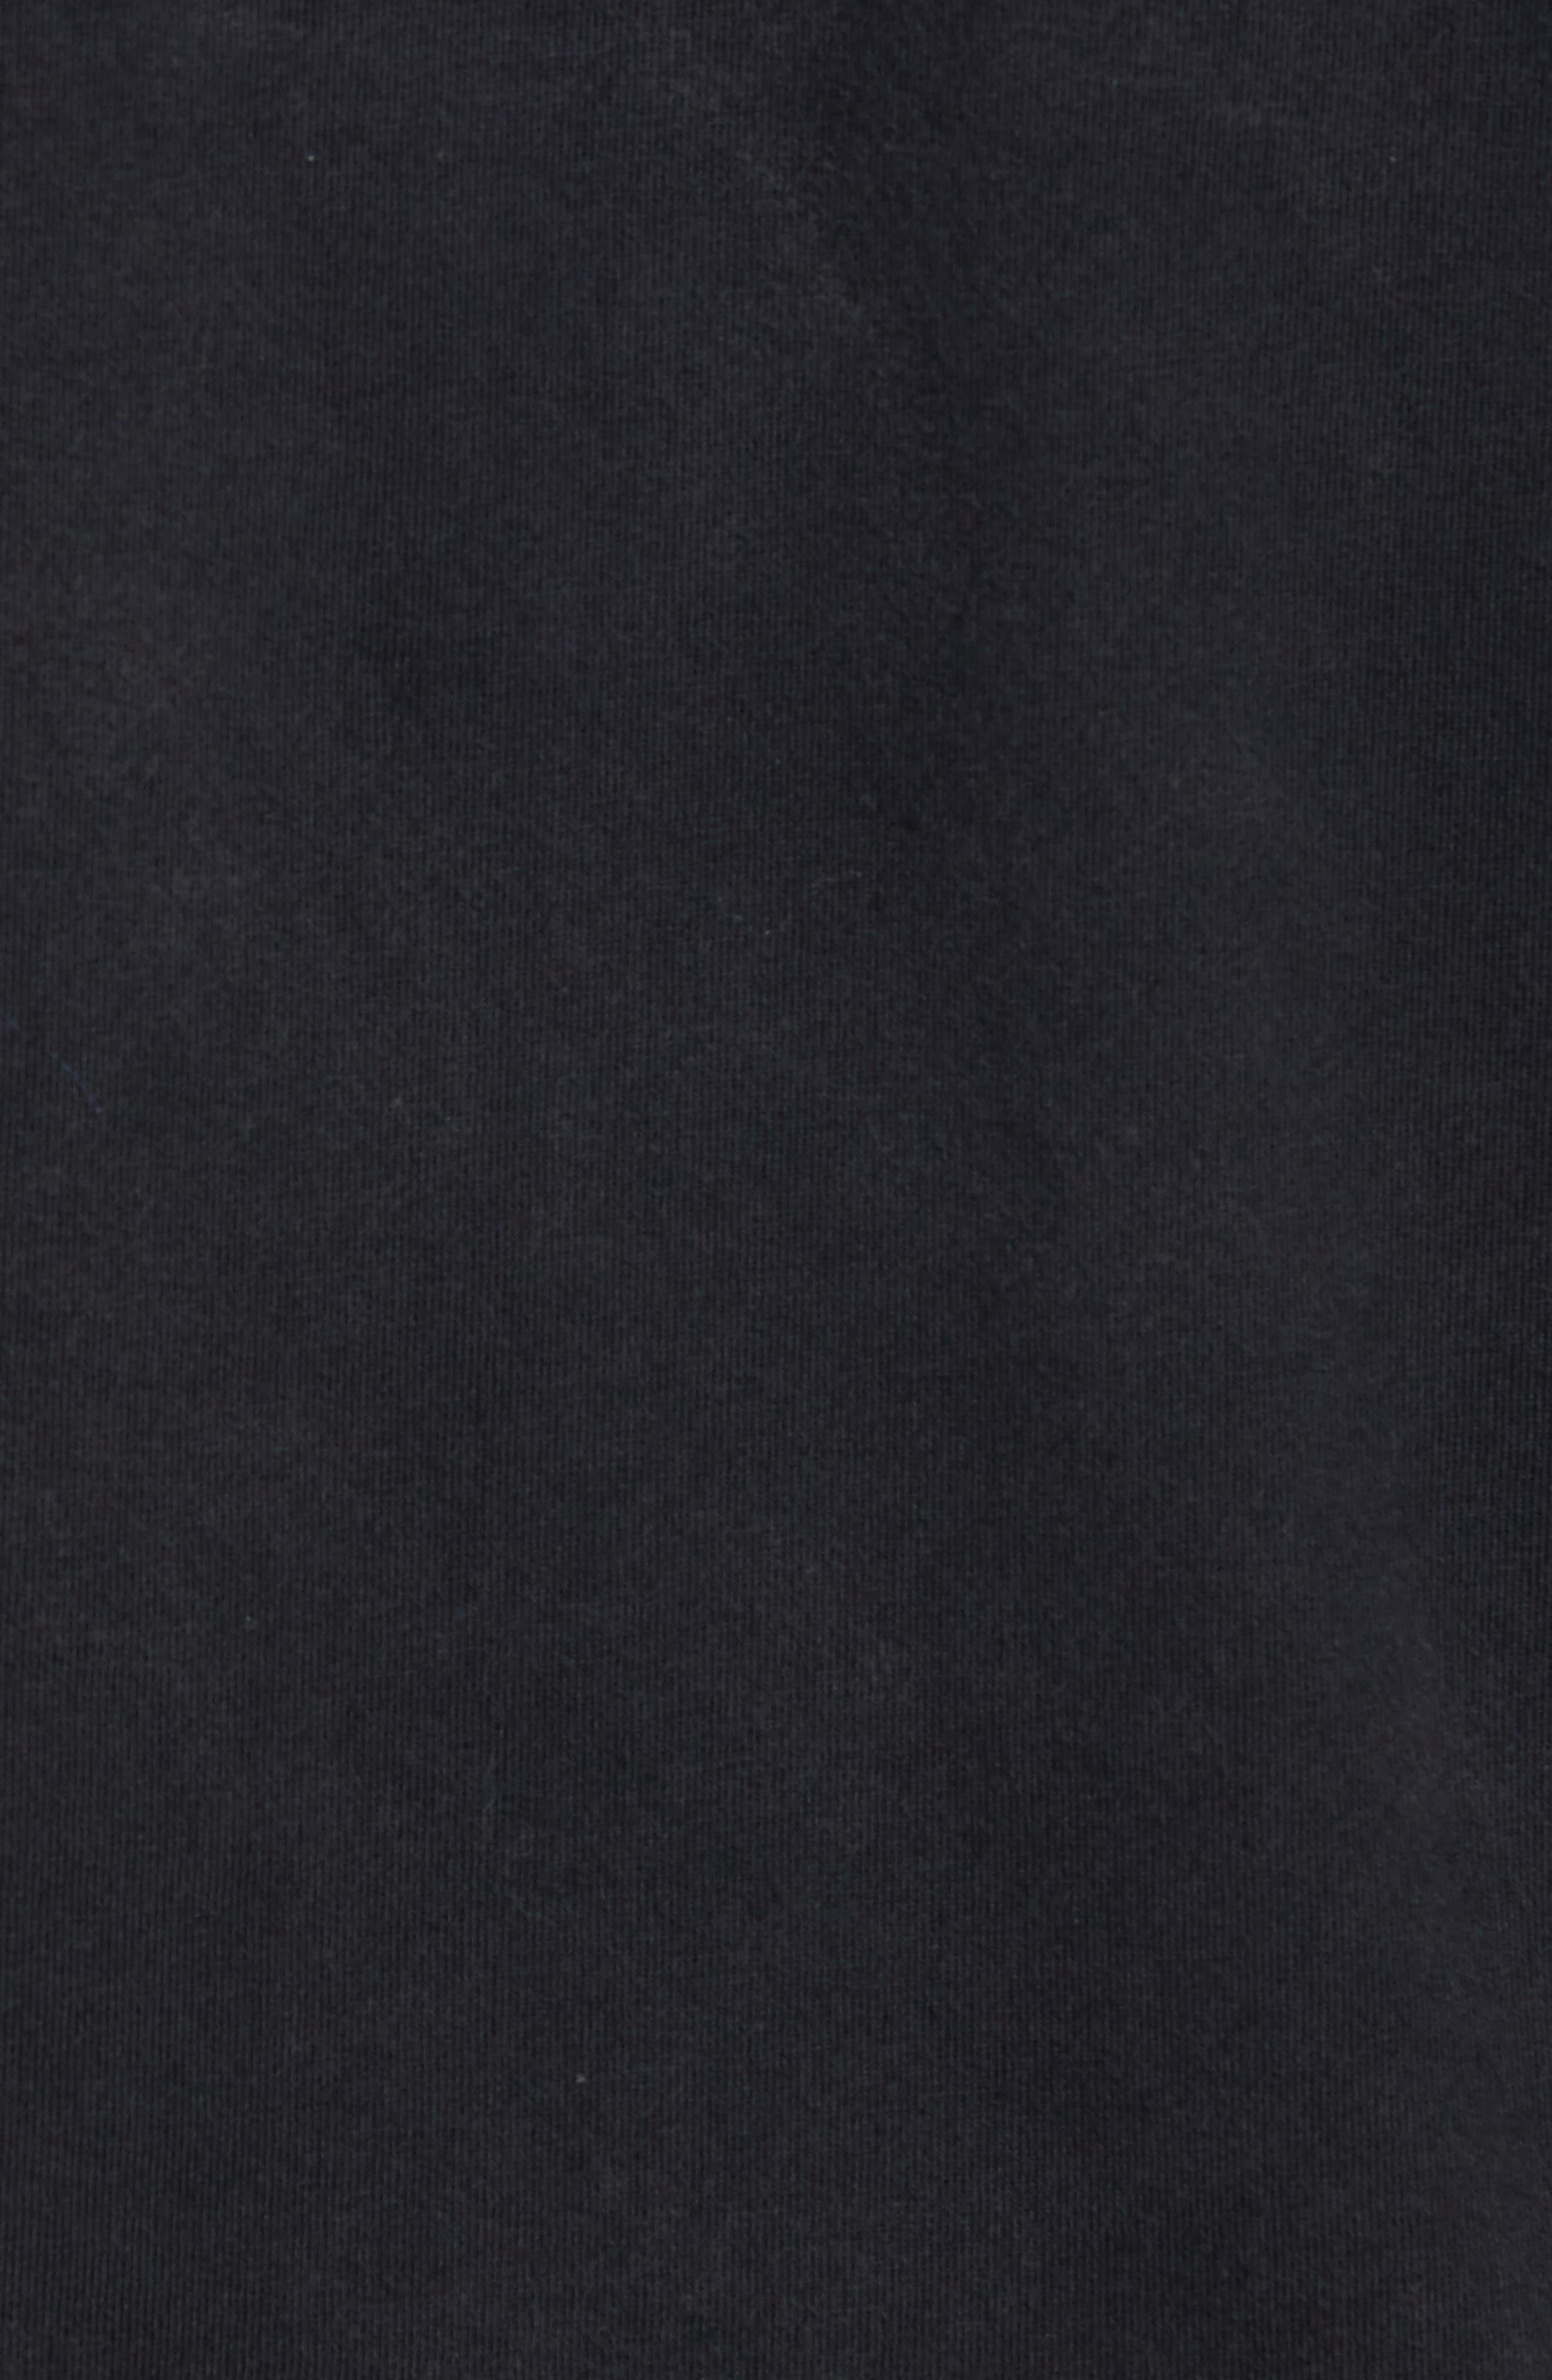 Black Widow Graphic T-Shirt,                             Alternate thumbnail 5, color,                             001